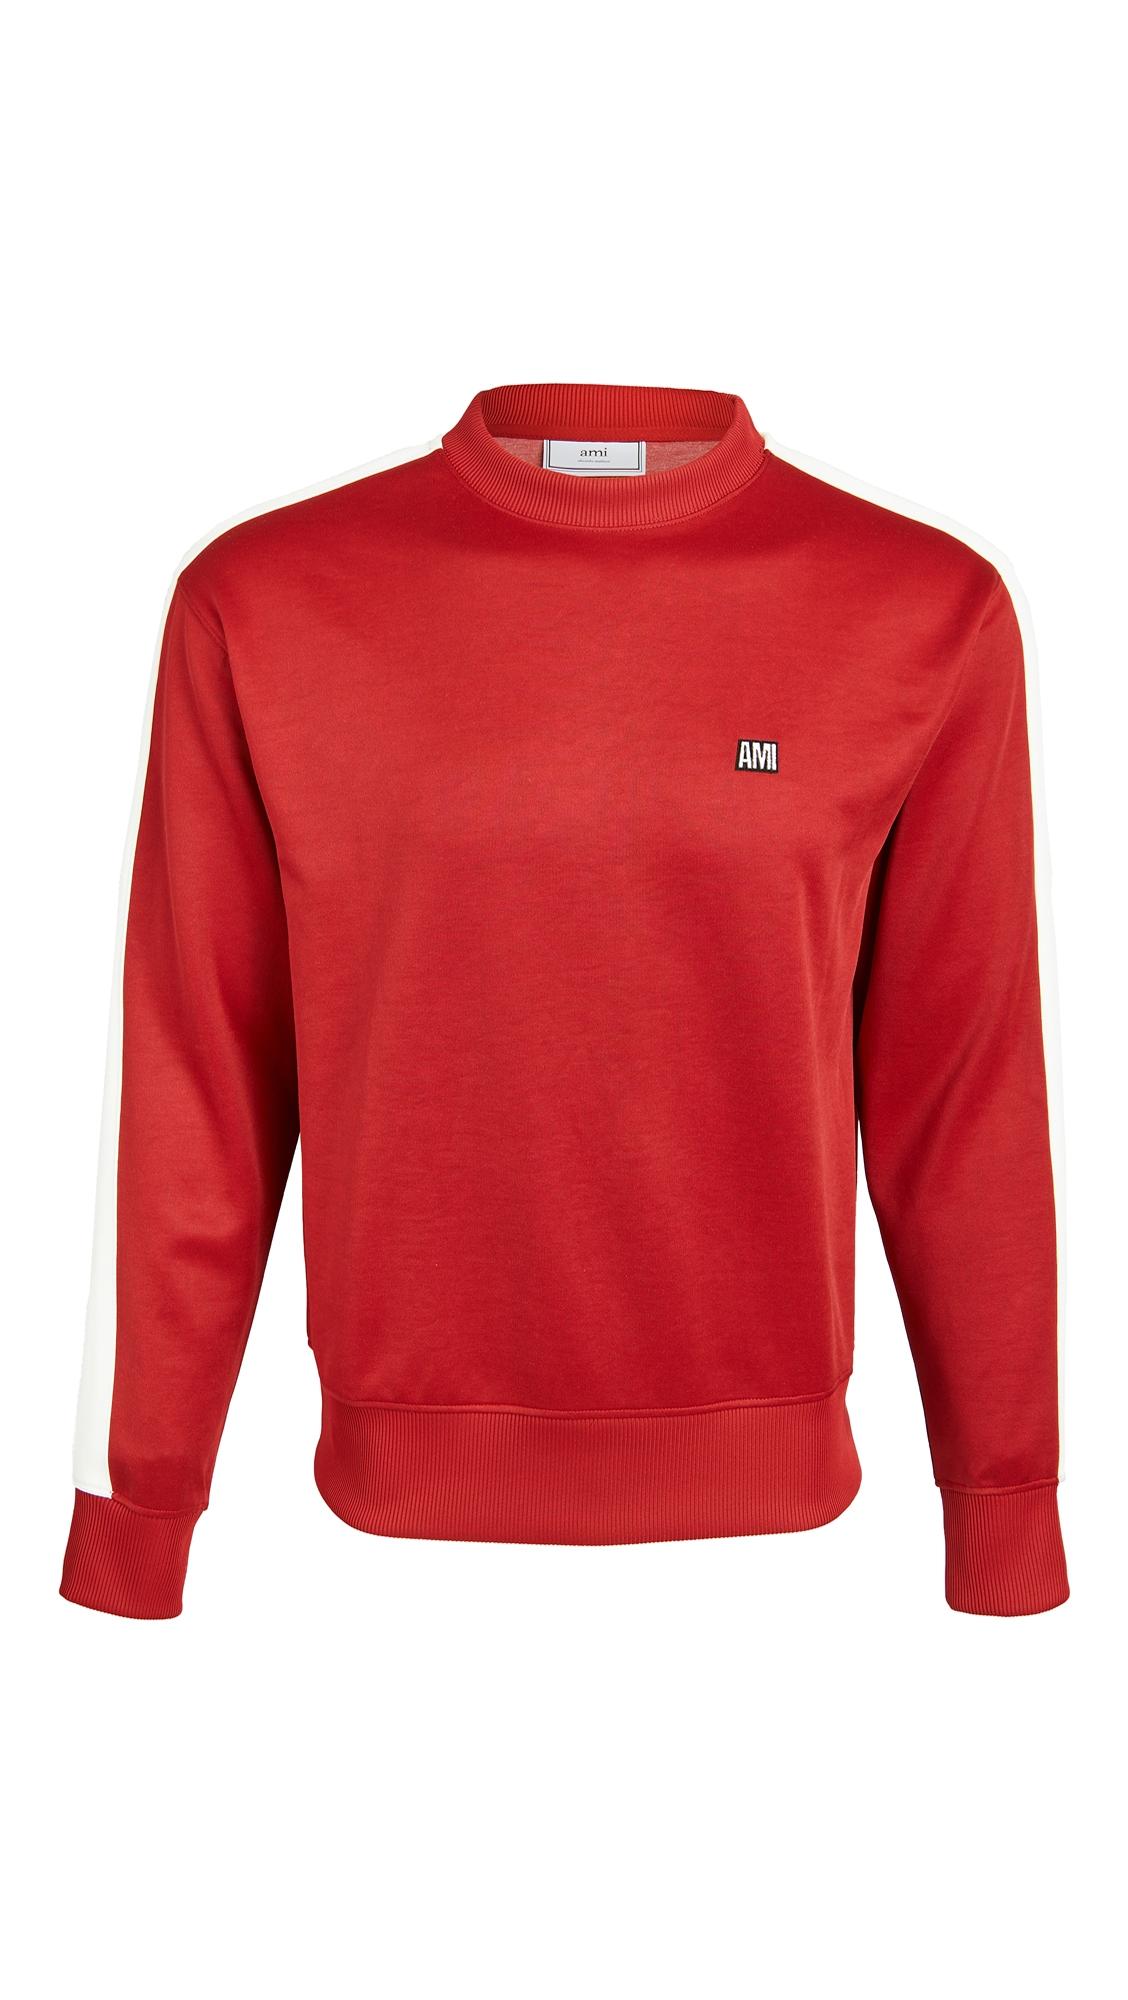 Ami Alexandre Mattiussi Embroidered Sweatshirt In Red